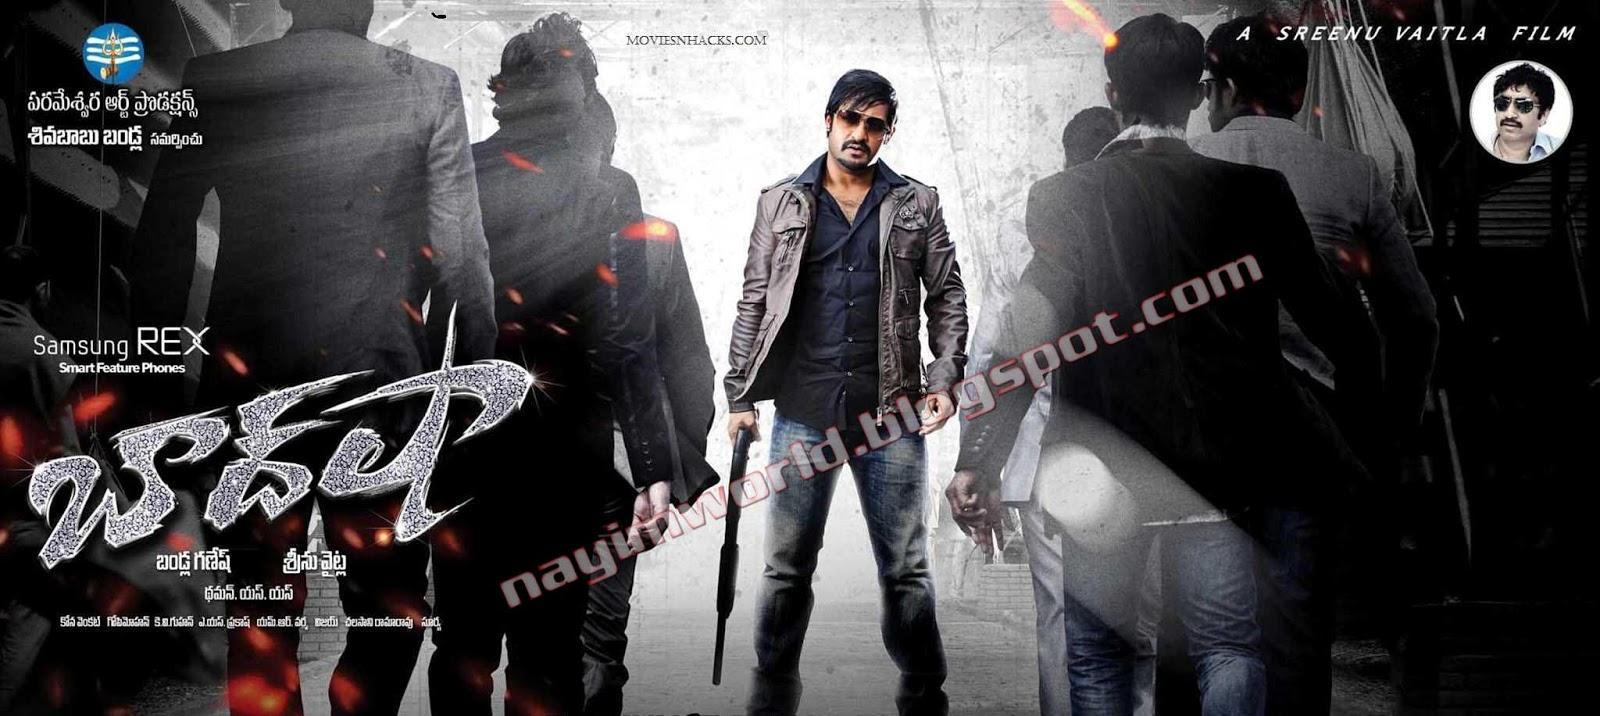 Baadshah (2013) Telugu Movie DvdRip Download | TechSoft24 ... Baadshah 2013 Film